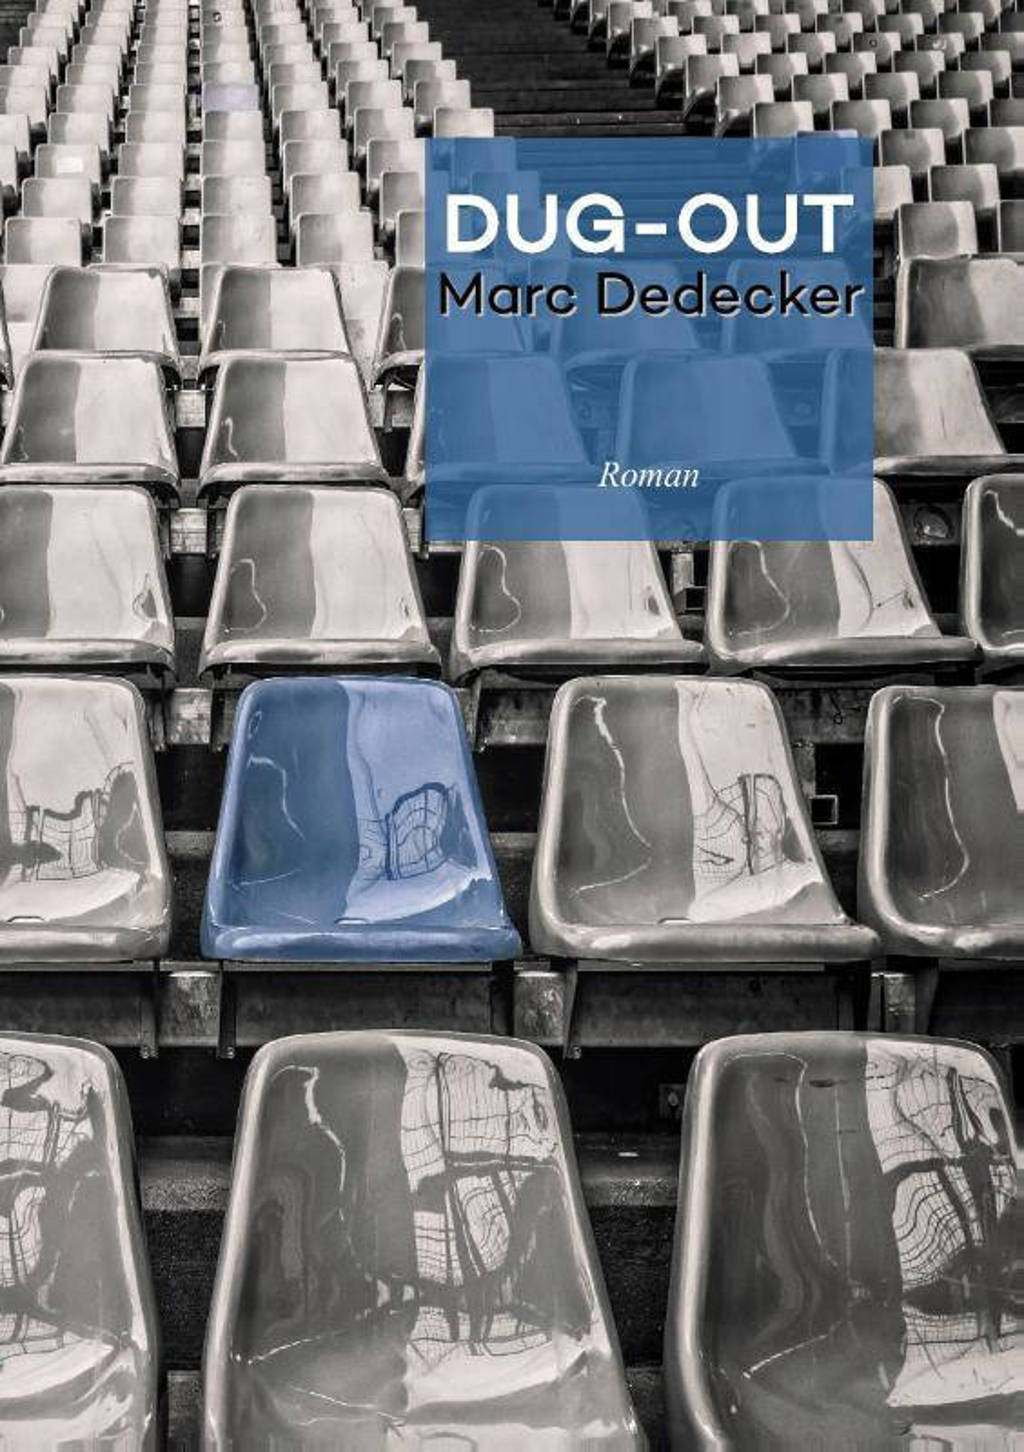 Dug-out - Marc Dedecker